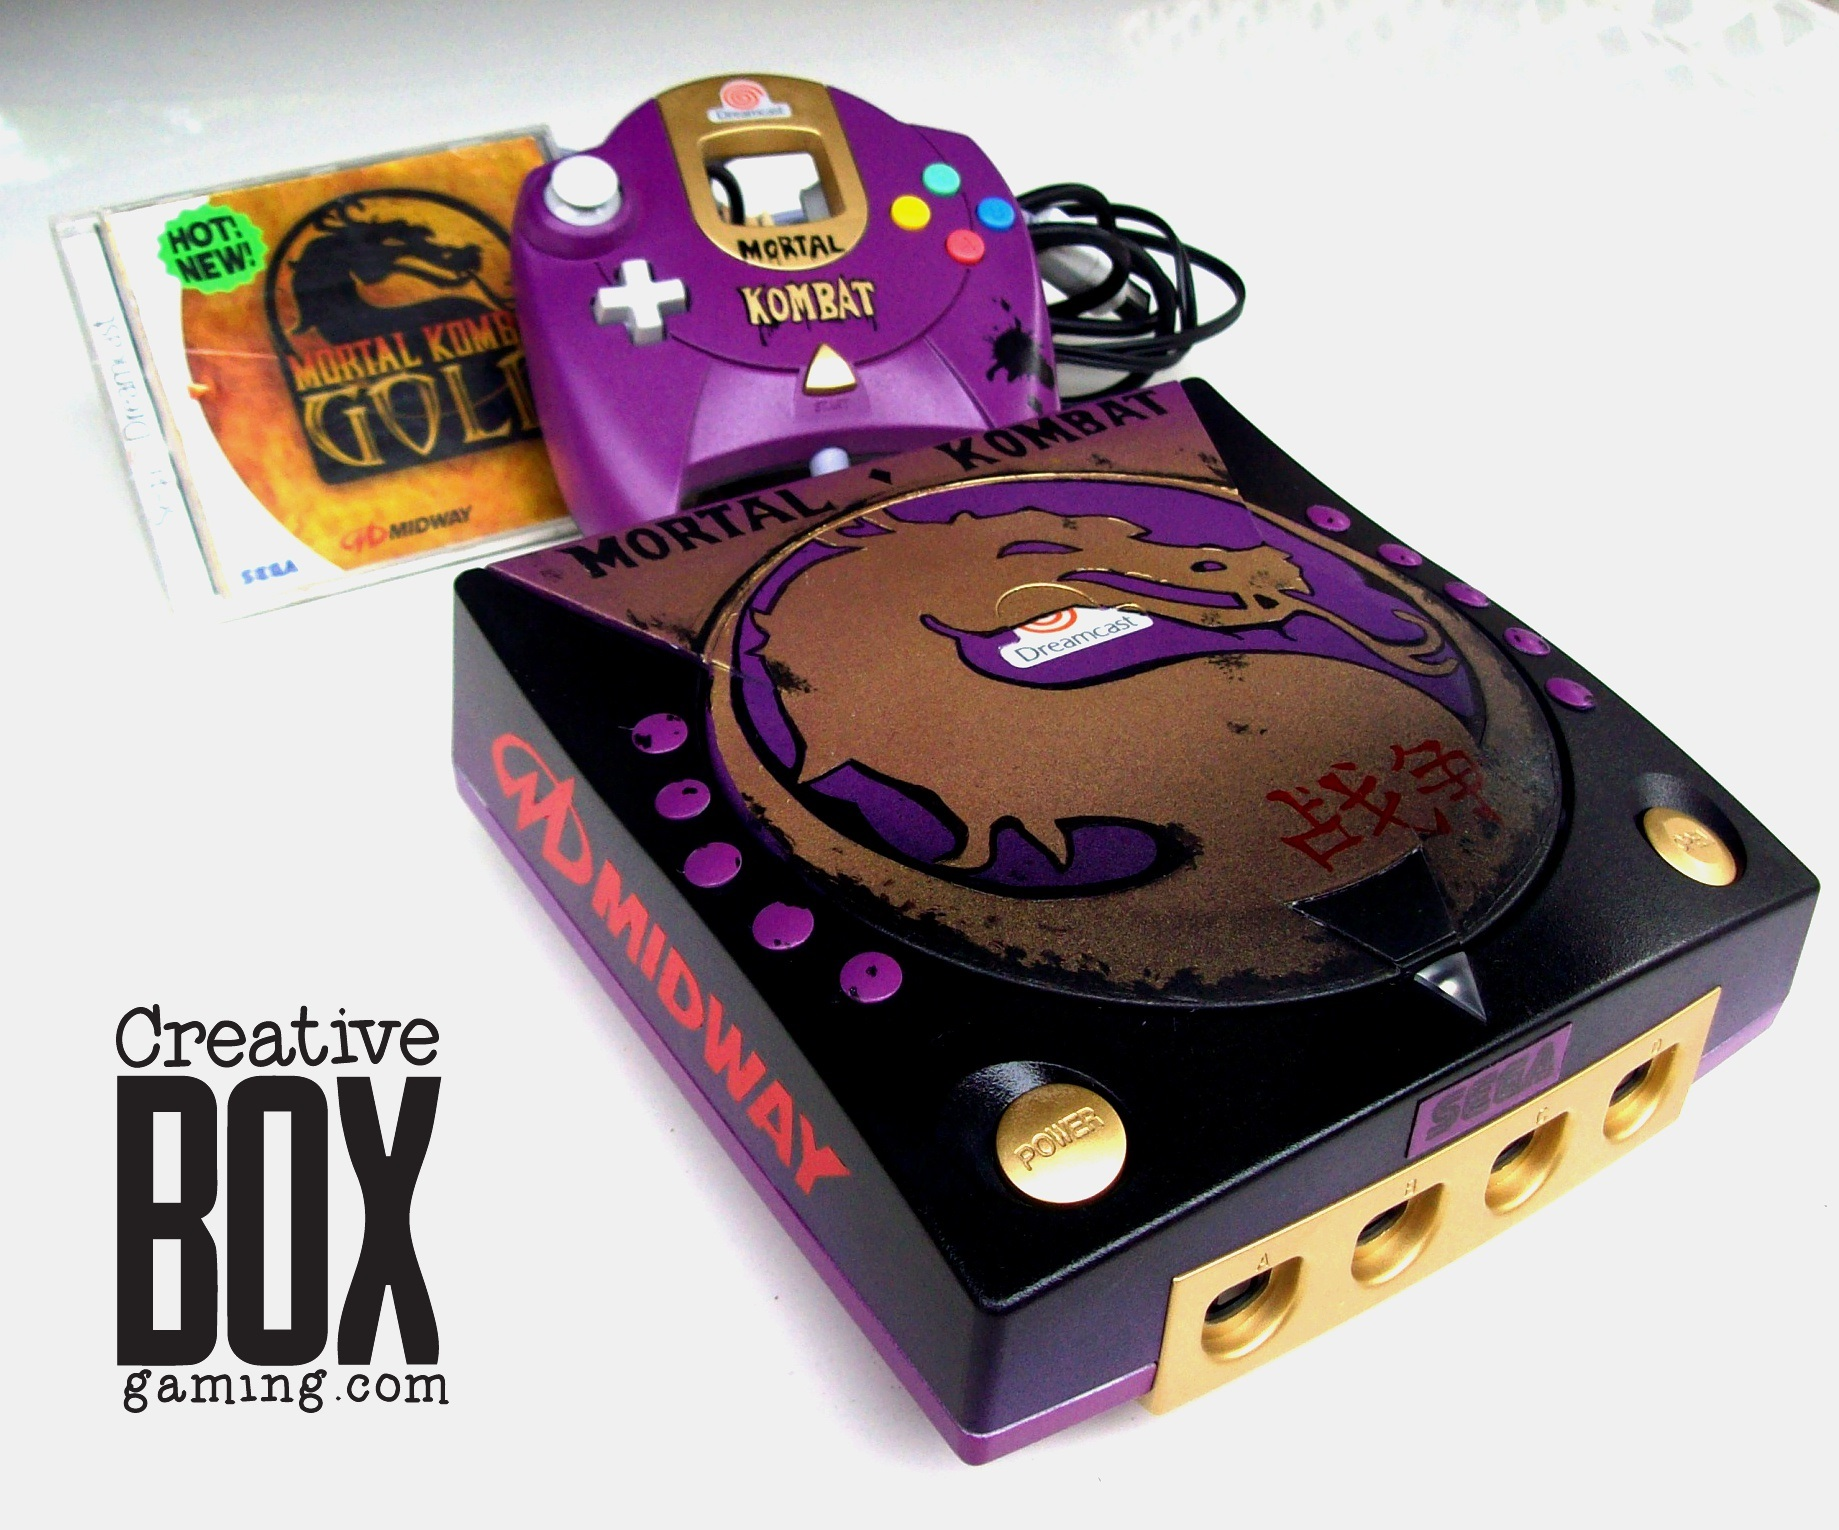 Mortal Kombat Custom Dreamcast Console by CreativeBoxGaming Mortal Kombat Custom Dreamcast Console by CreativeBoxGaming